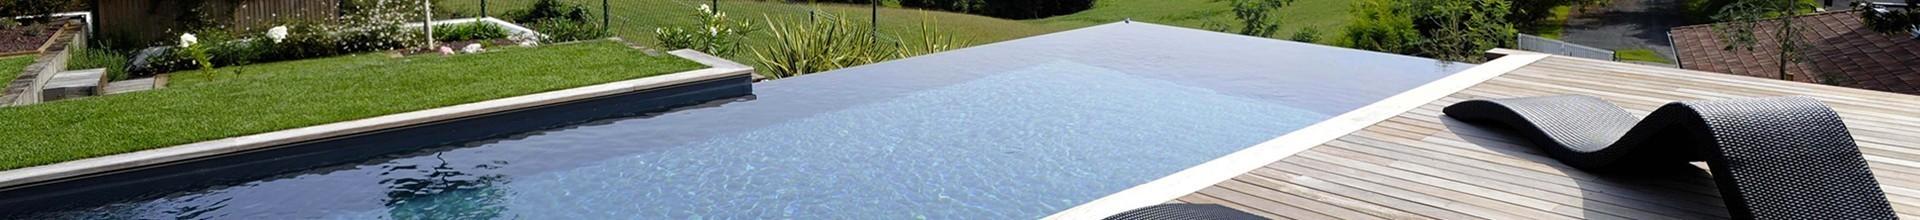 Direct usine, piscine coque prix Aube